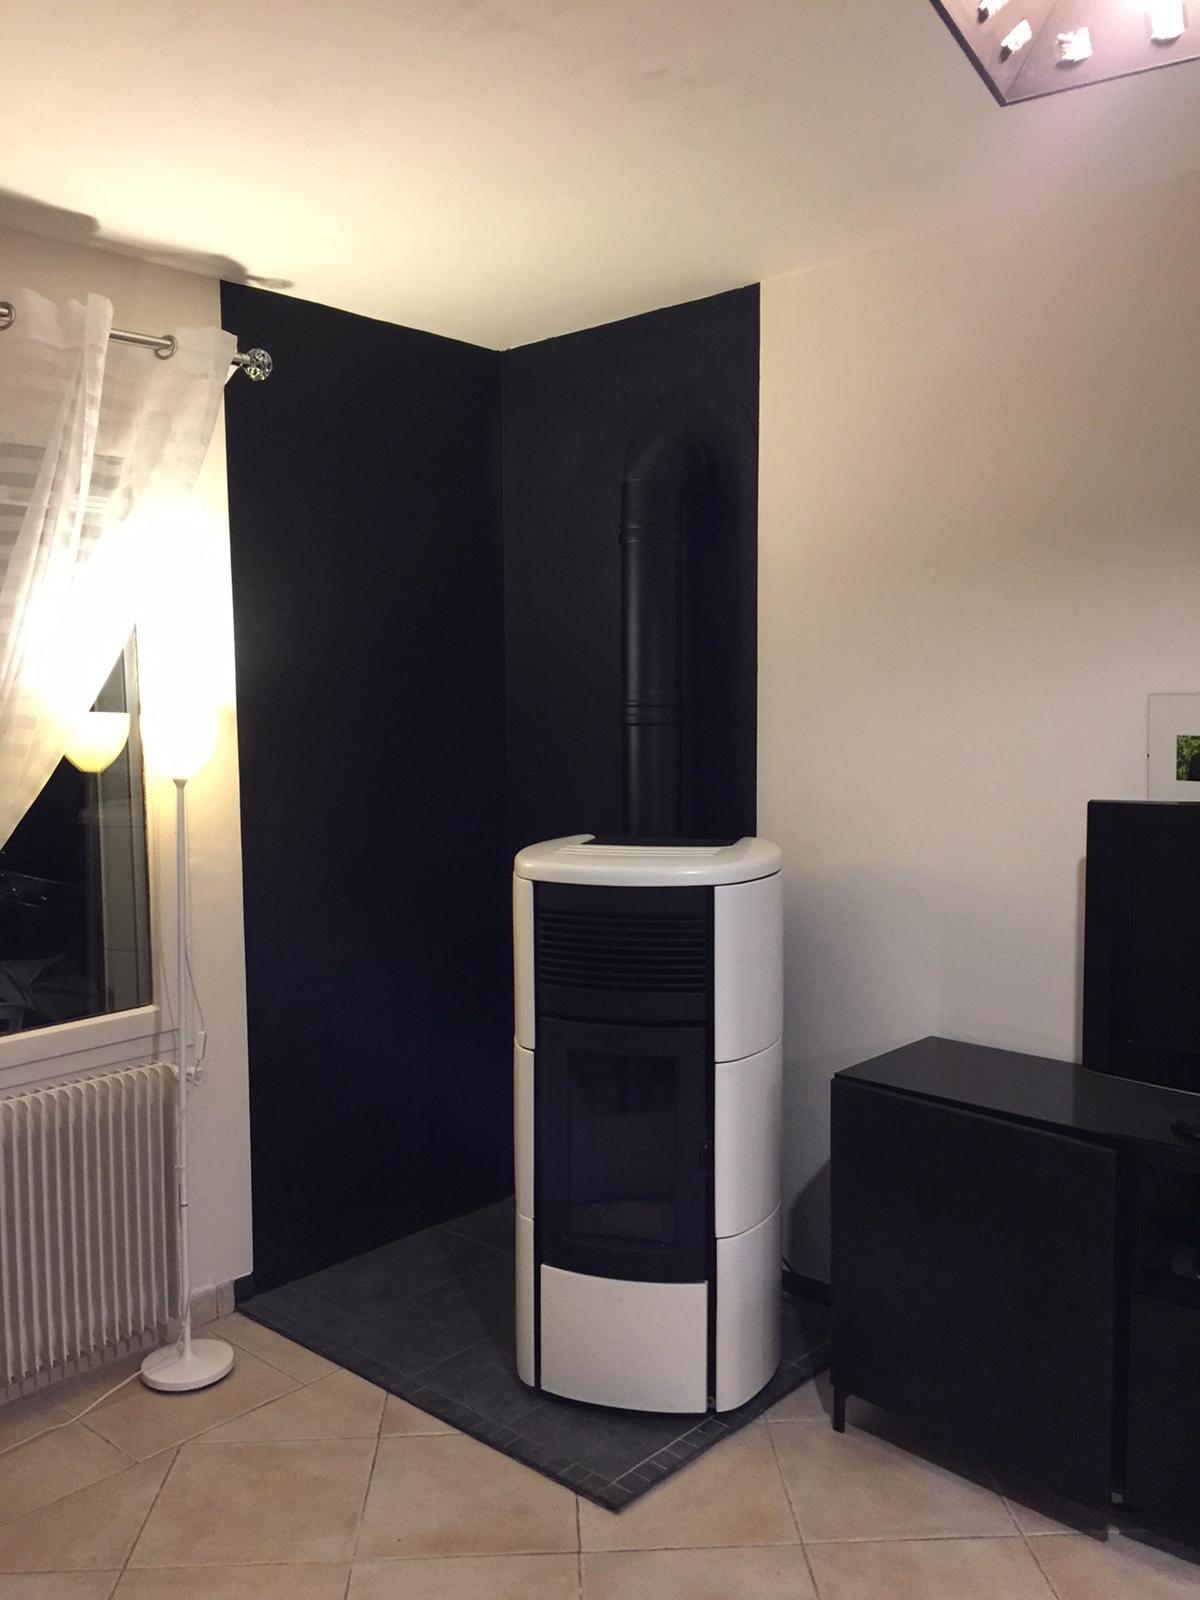 pose d 39 un po le granul s mcz club draguignan. Black Bedroom Furniture Sets. Home Design Ideas